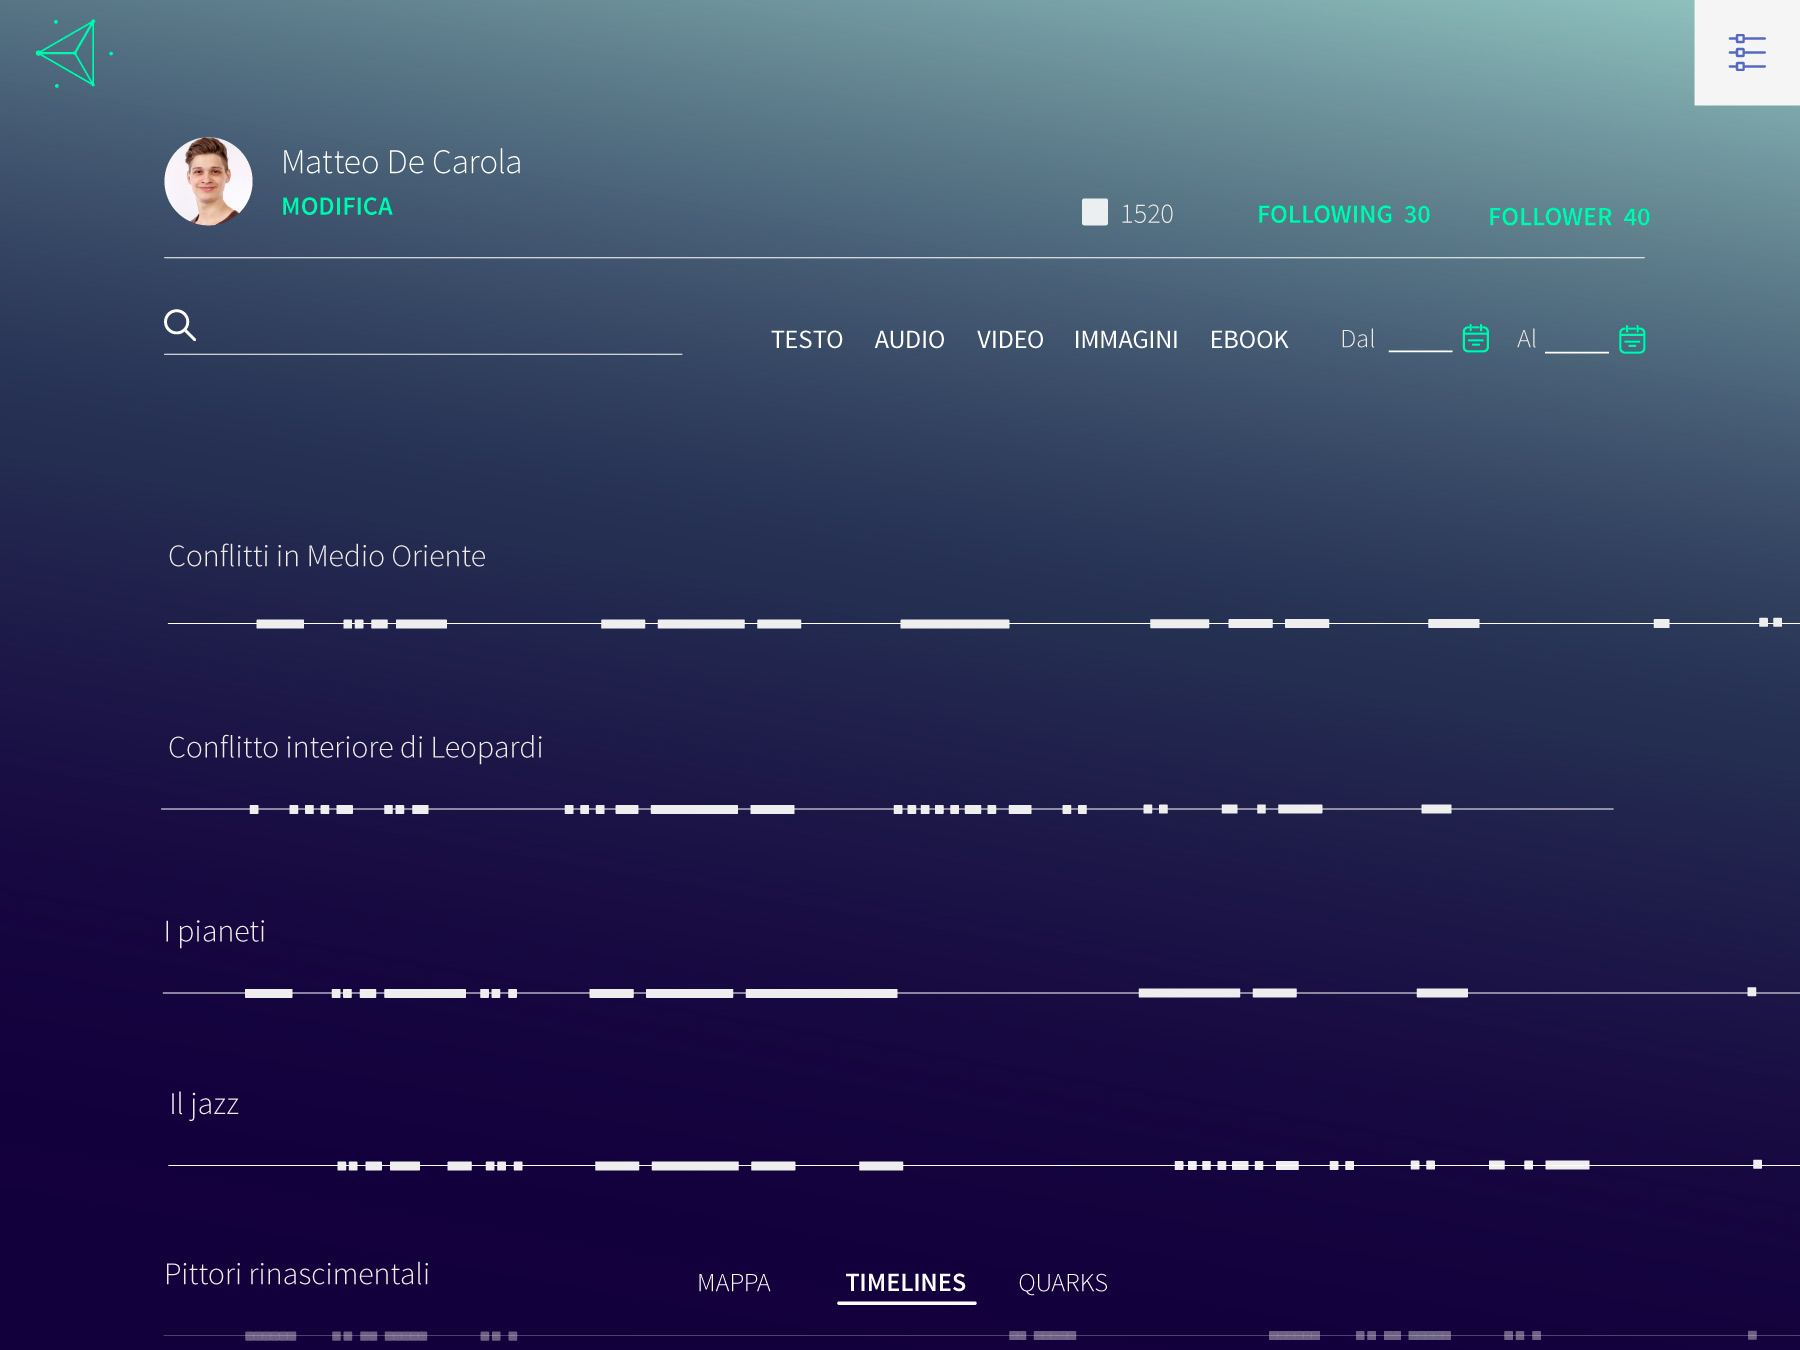 dashboard_timeline